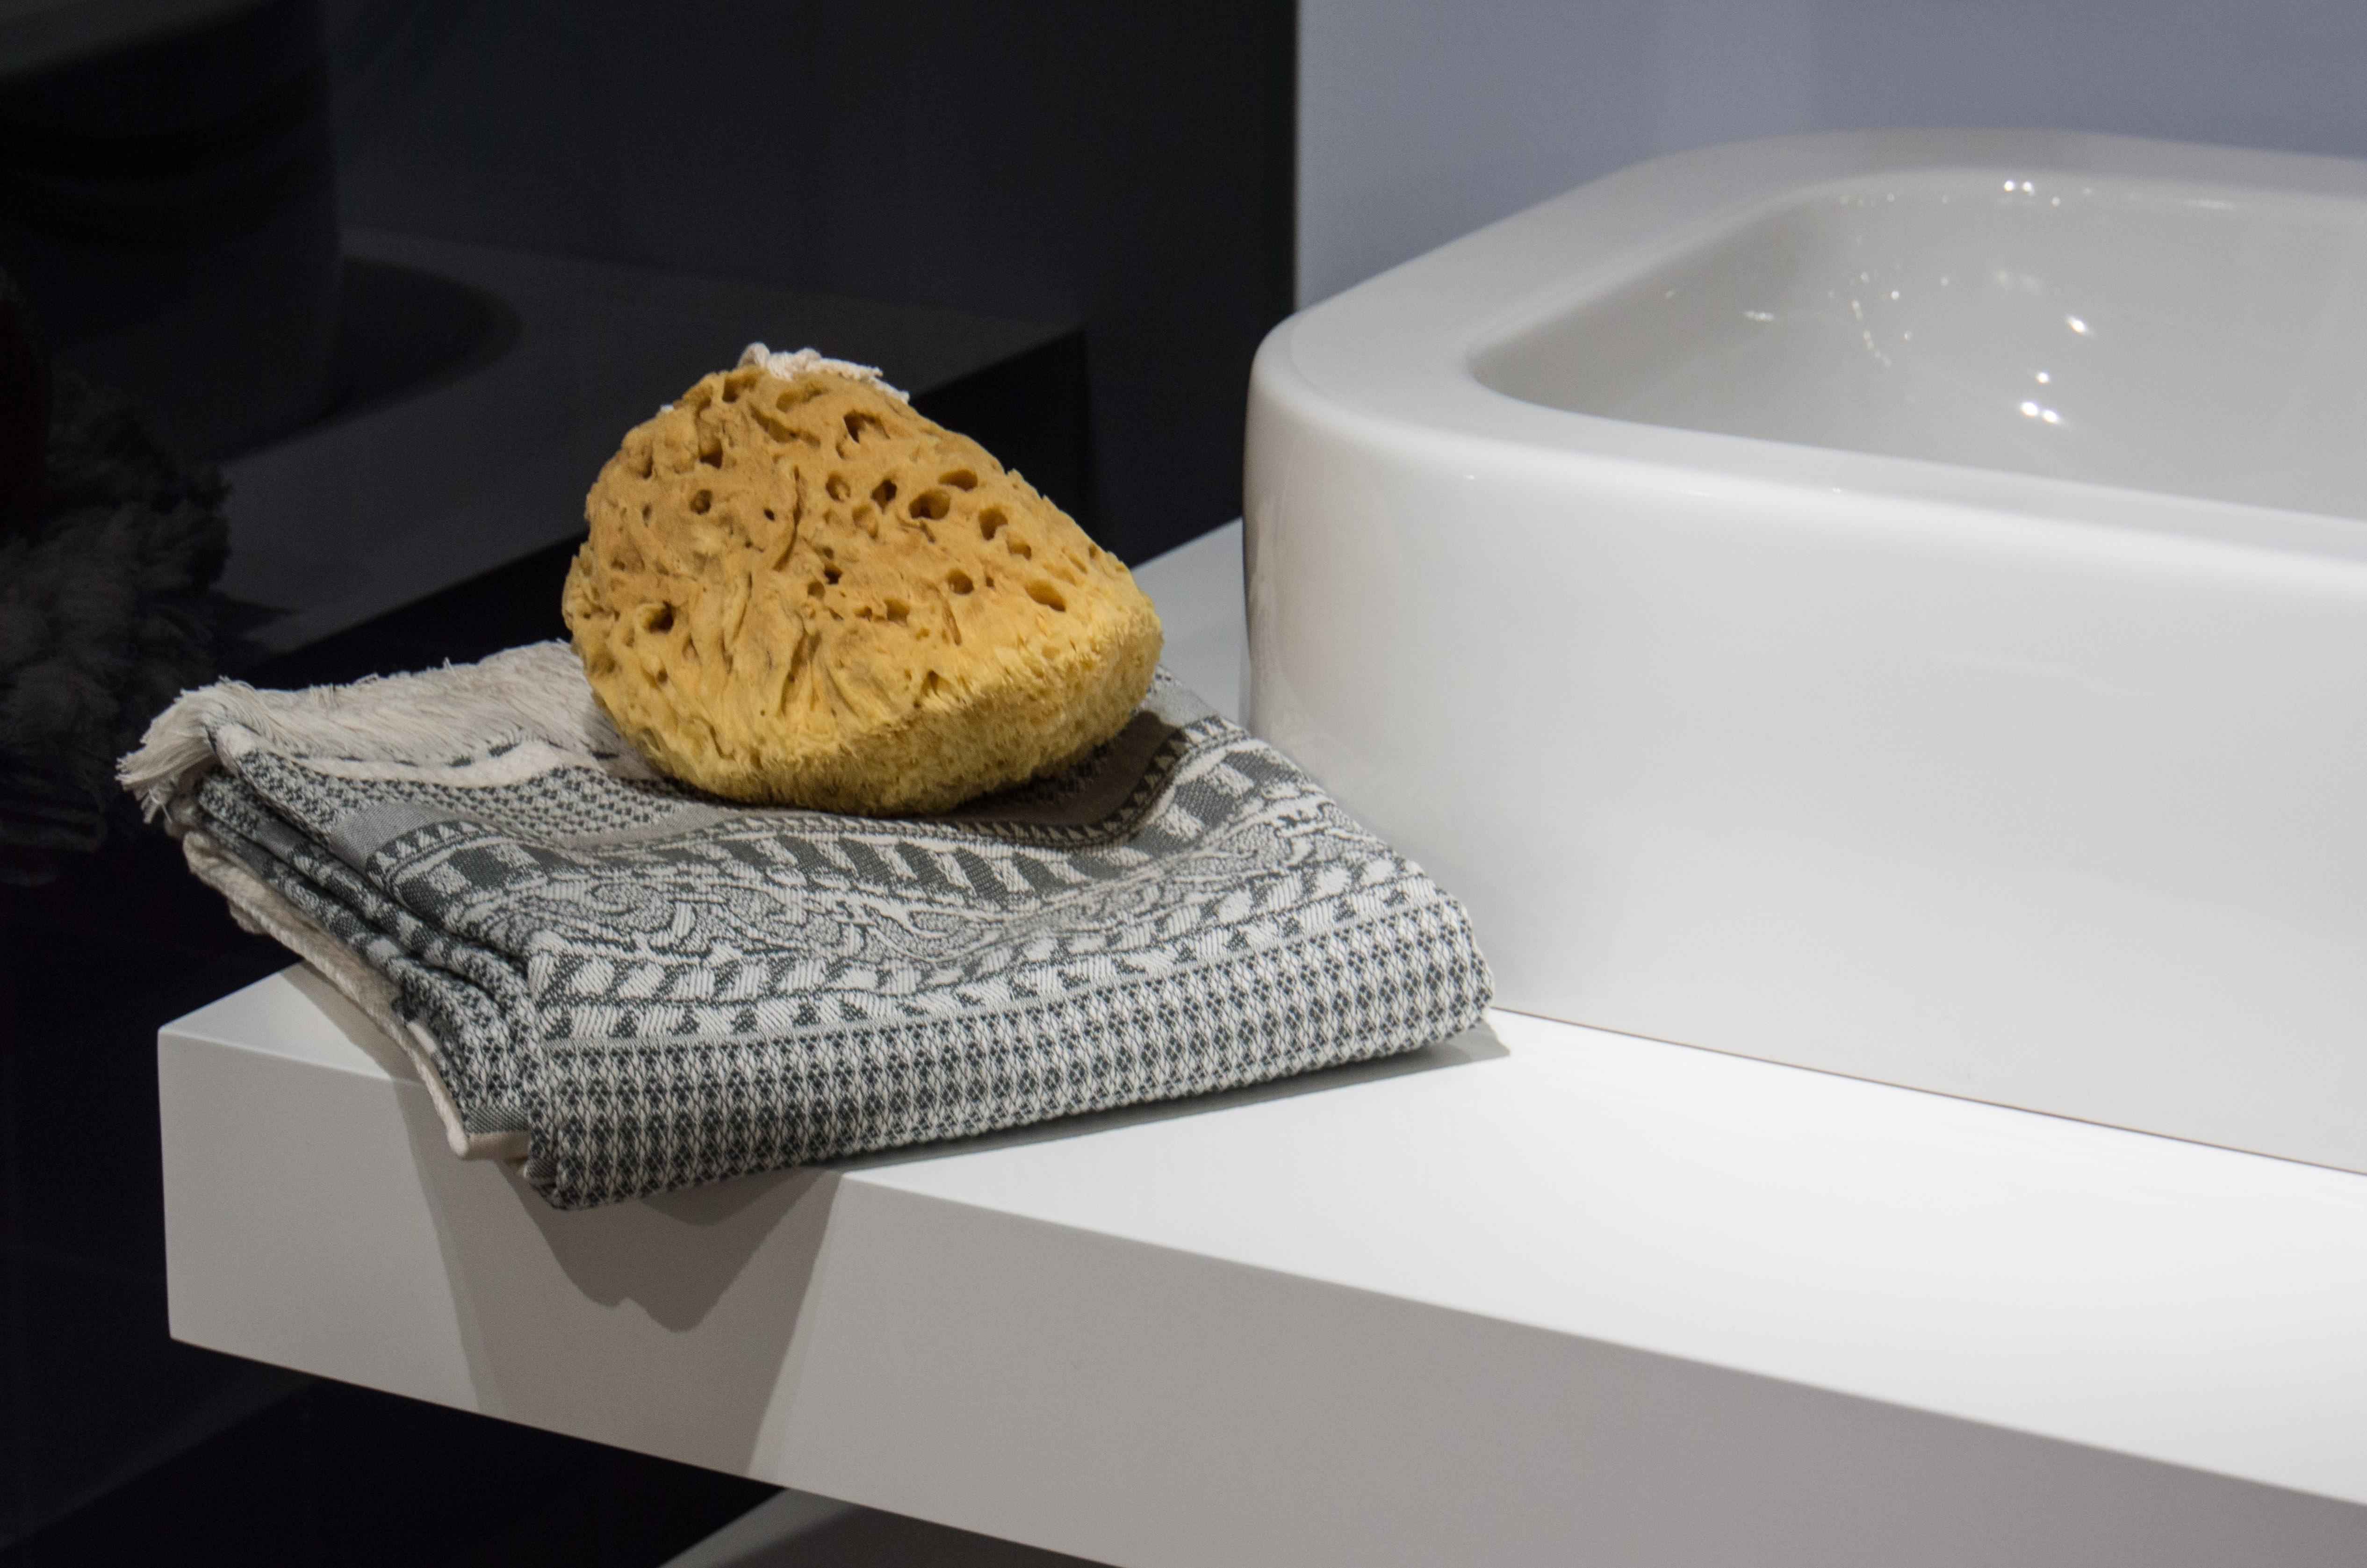 badbeleuchtung online | leuchtenzentrale.de, Badezimmer ideen